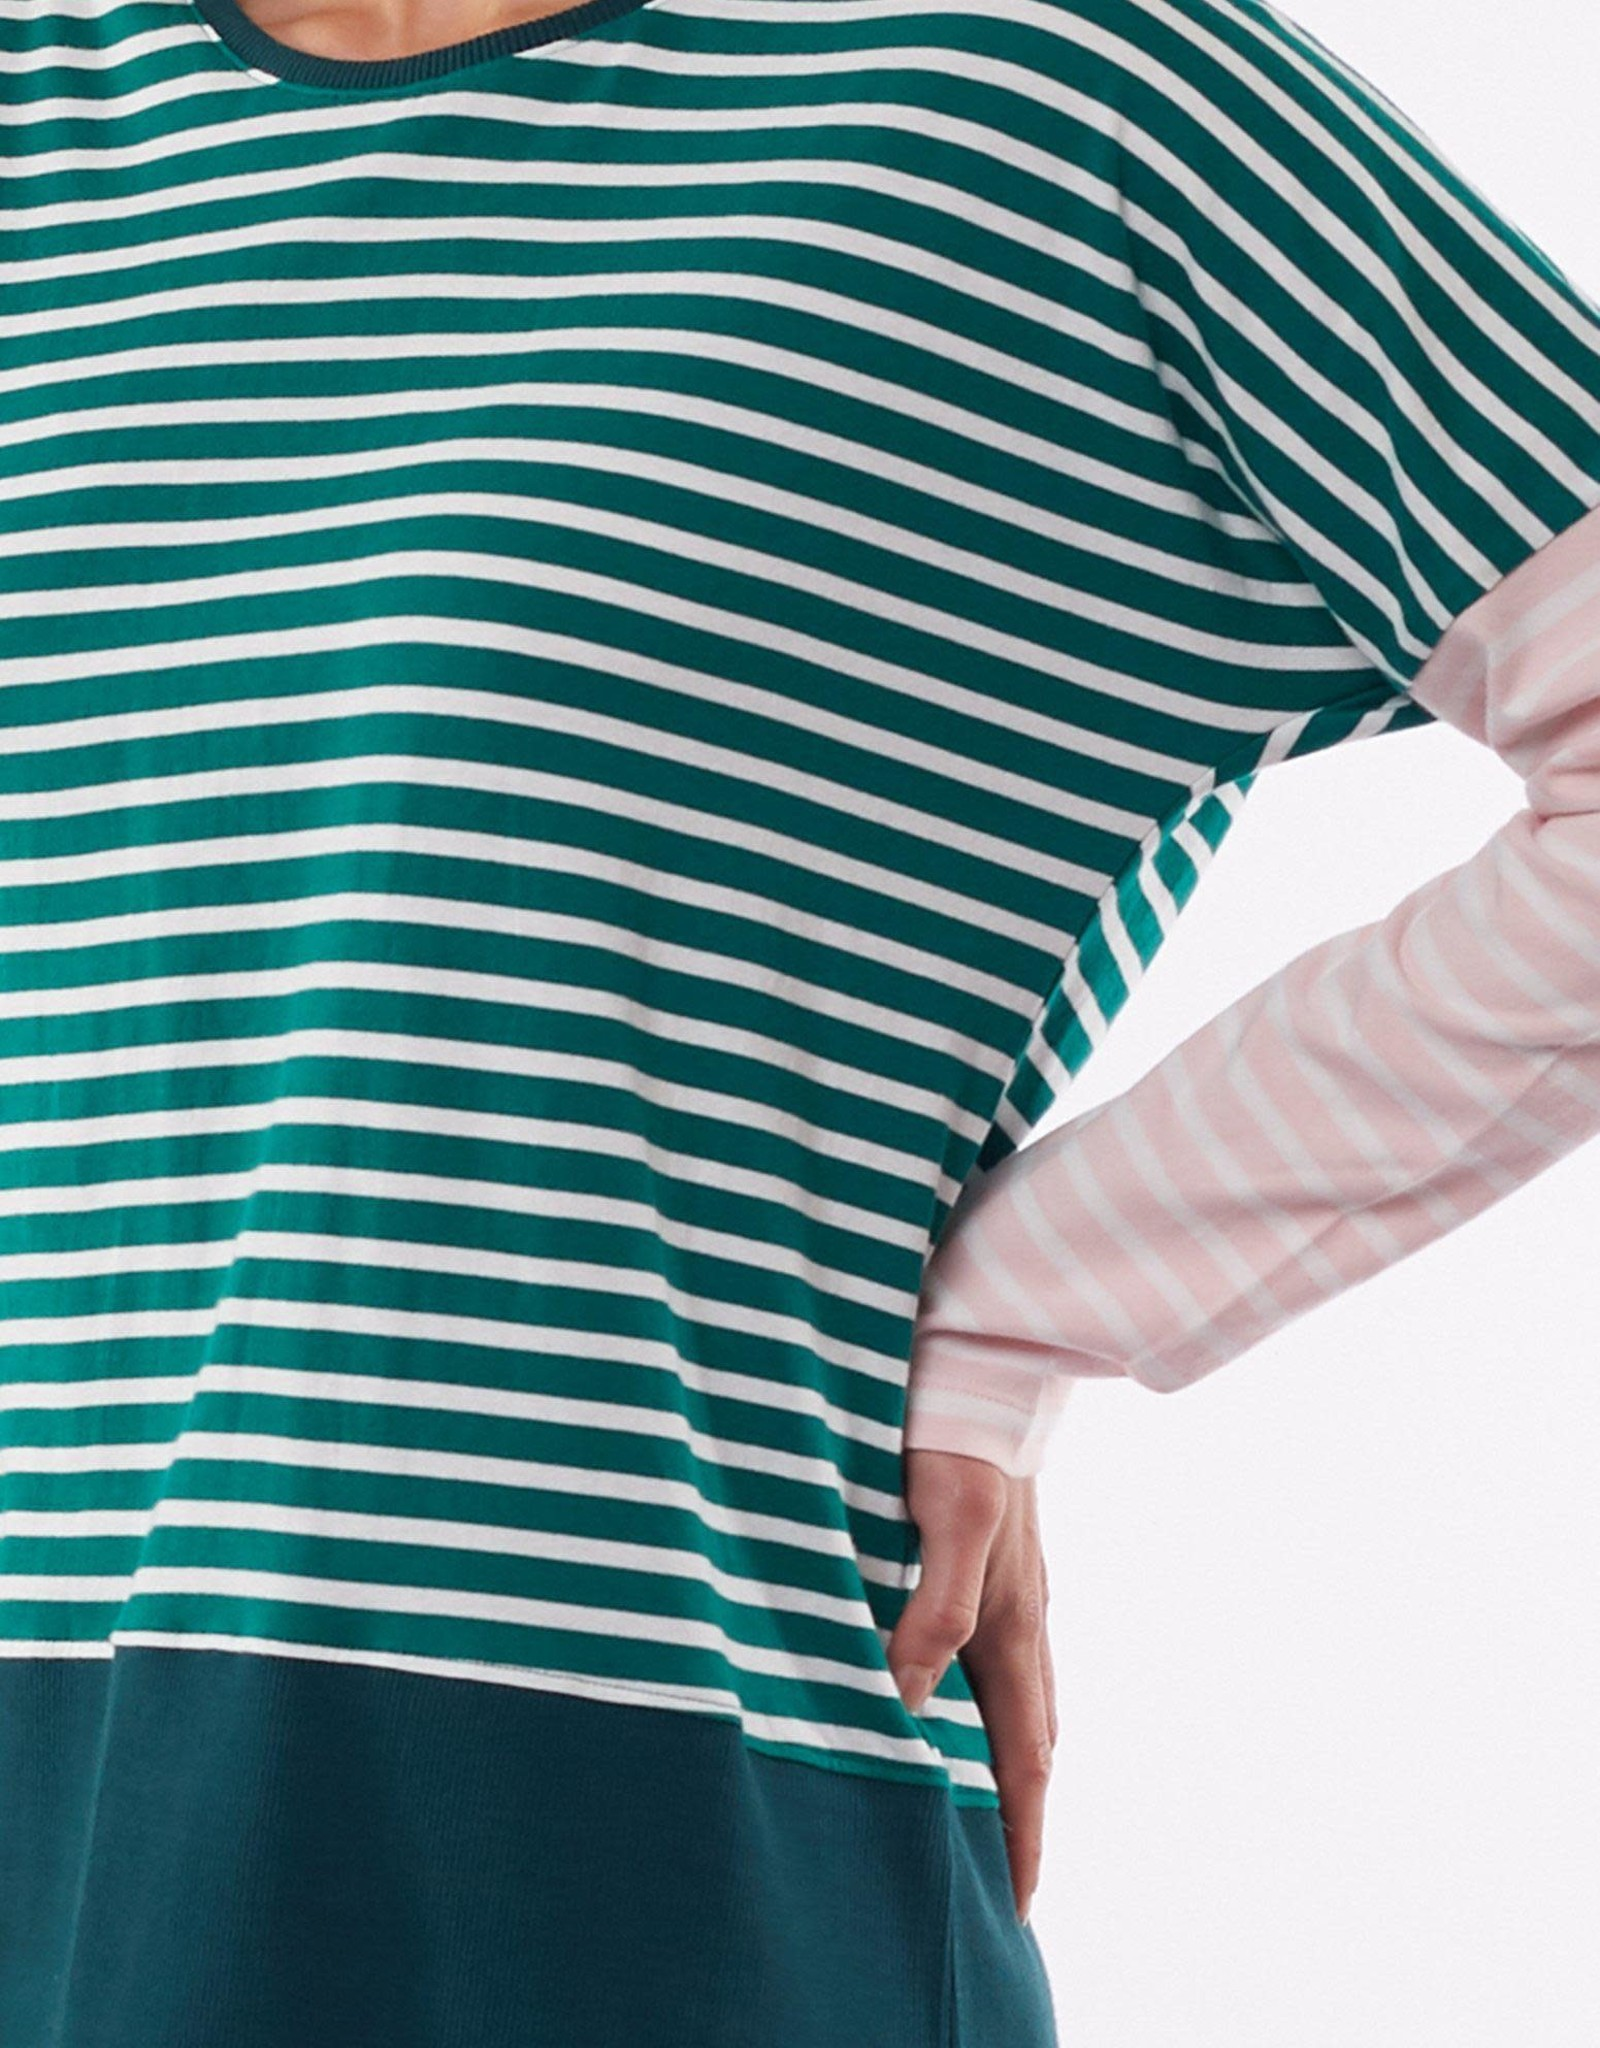 ELM ELM Liberty Stripe Long Sleeve Tee